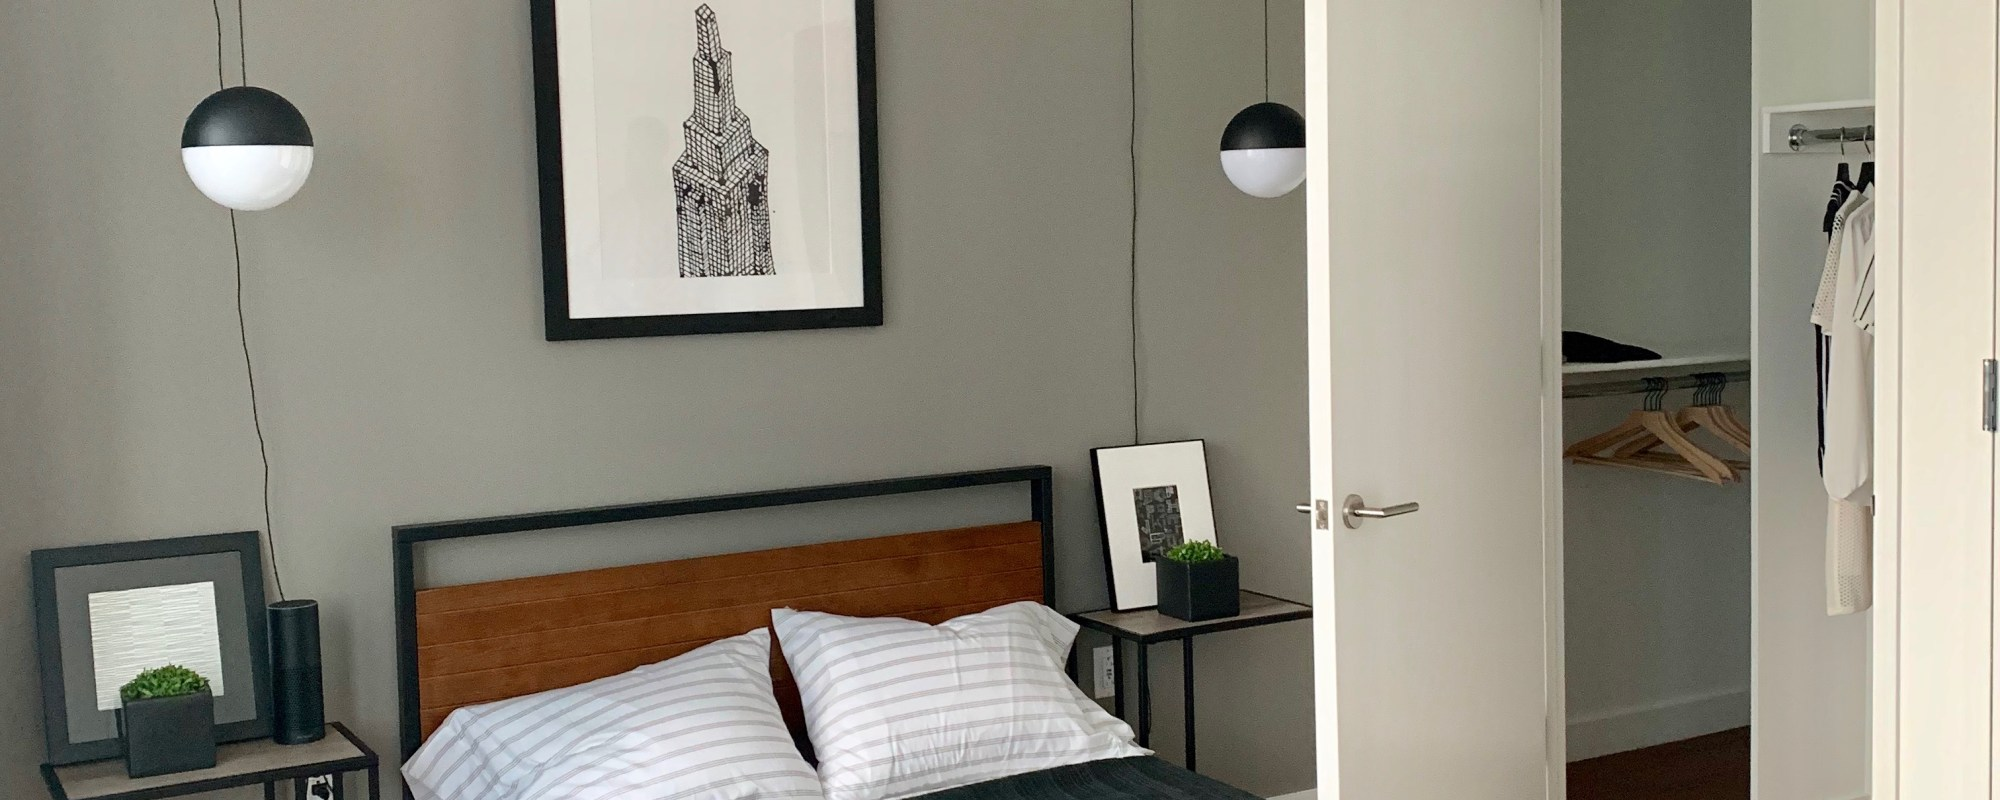 luxury midtown west apartment